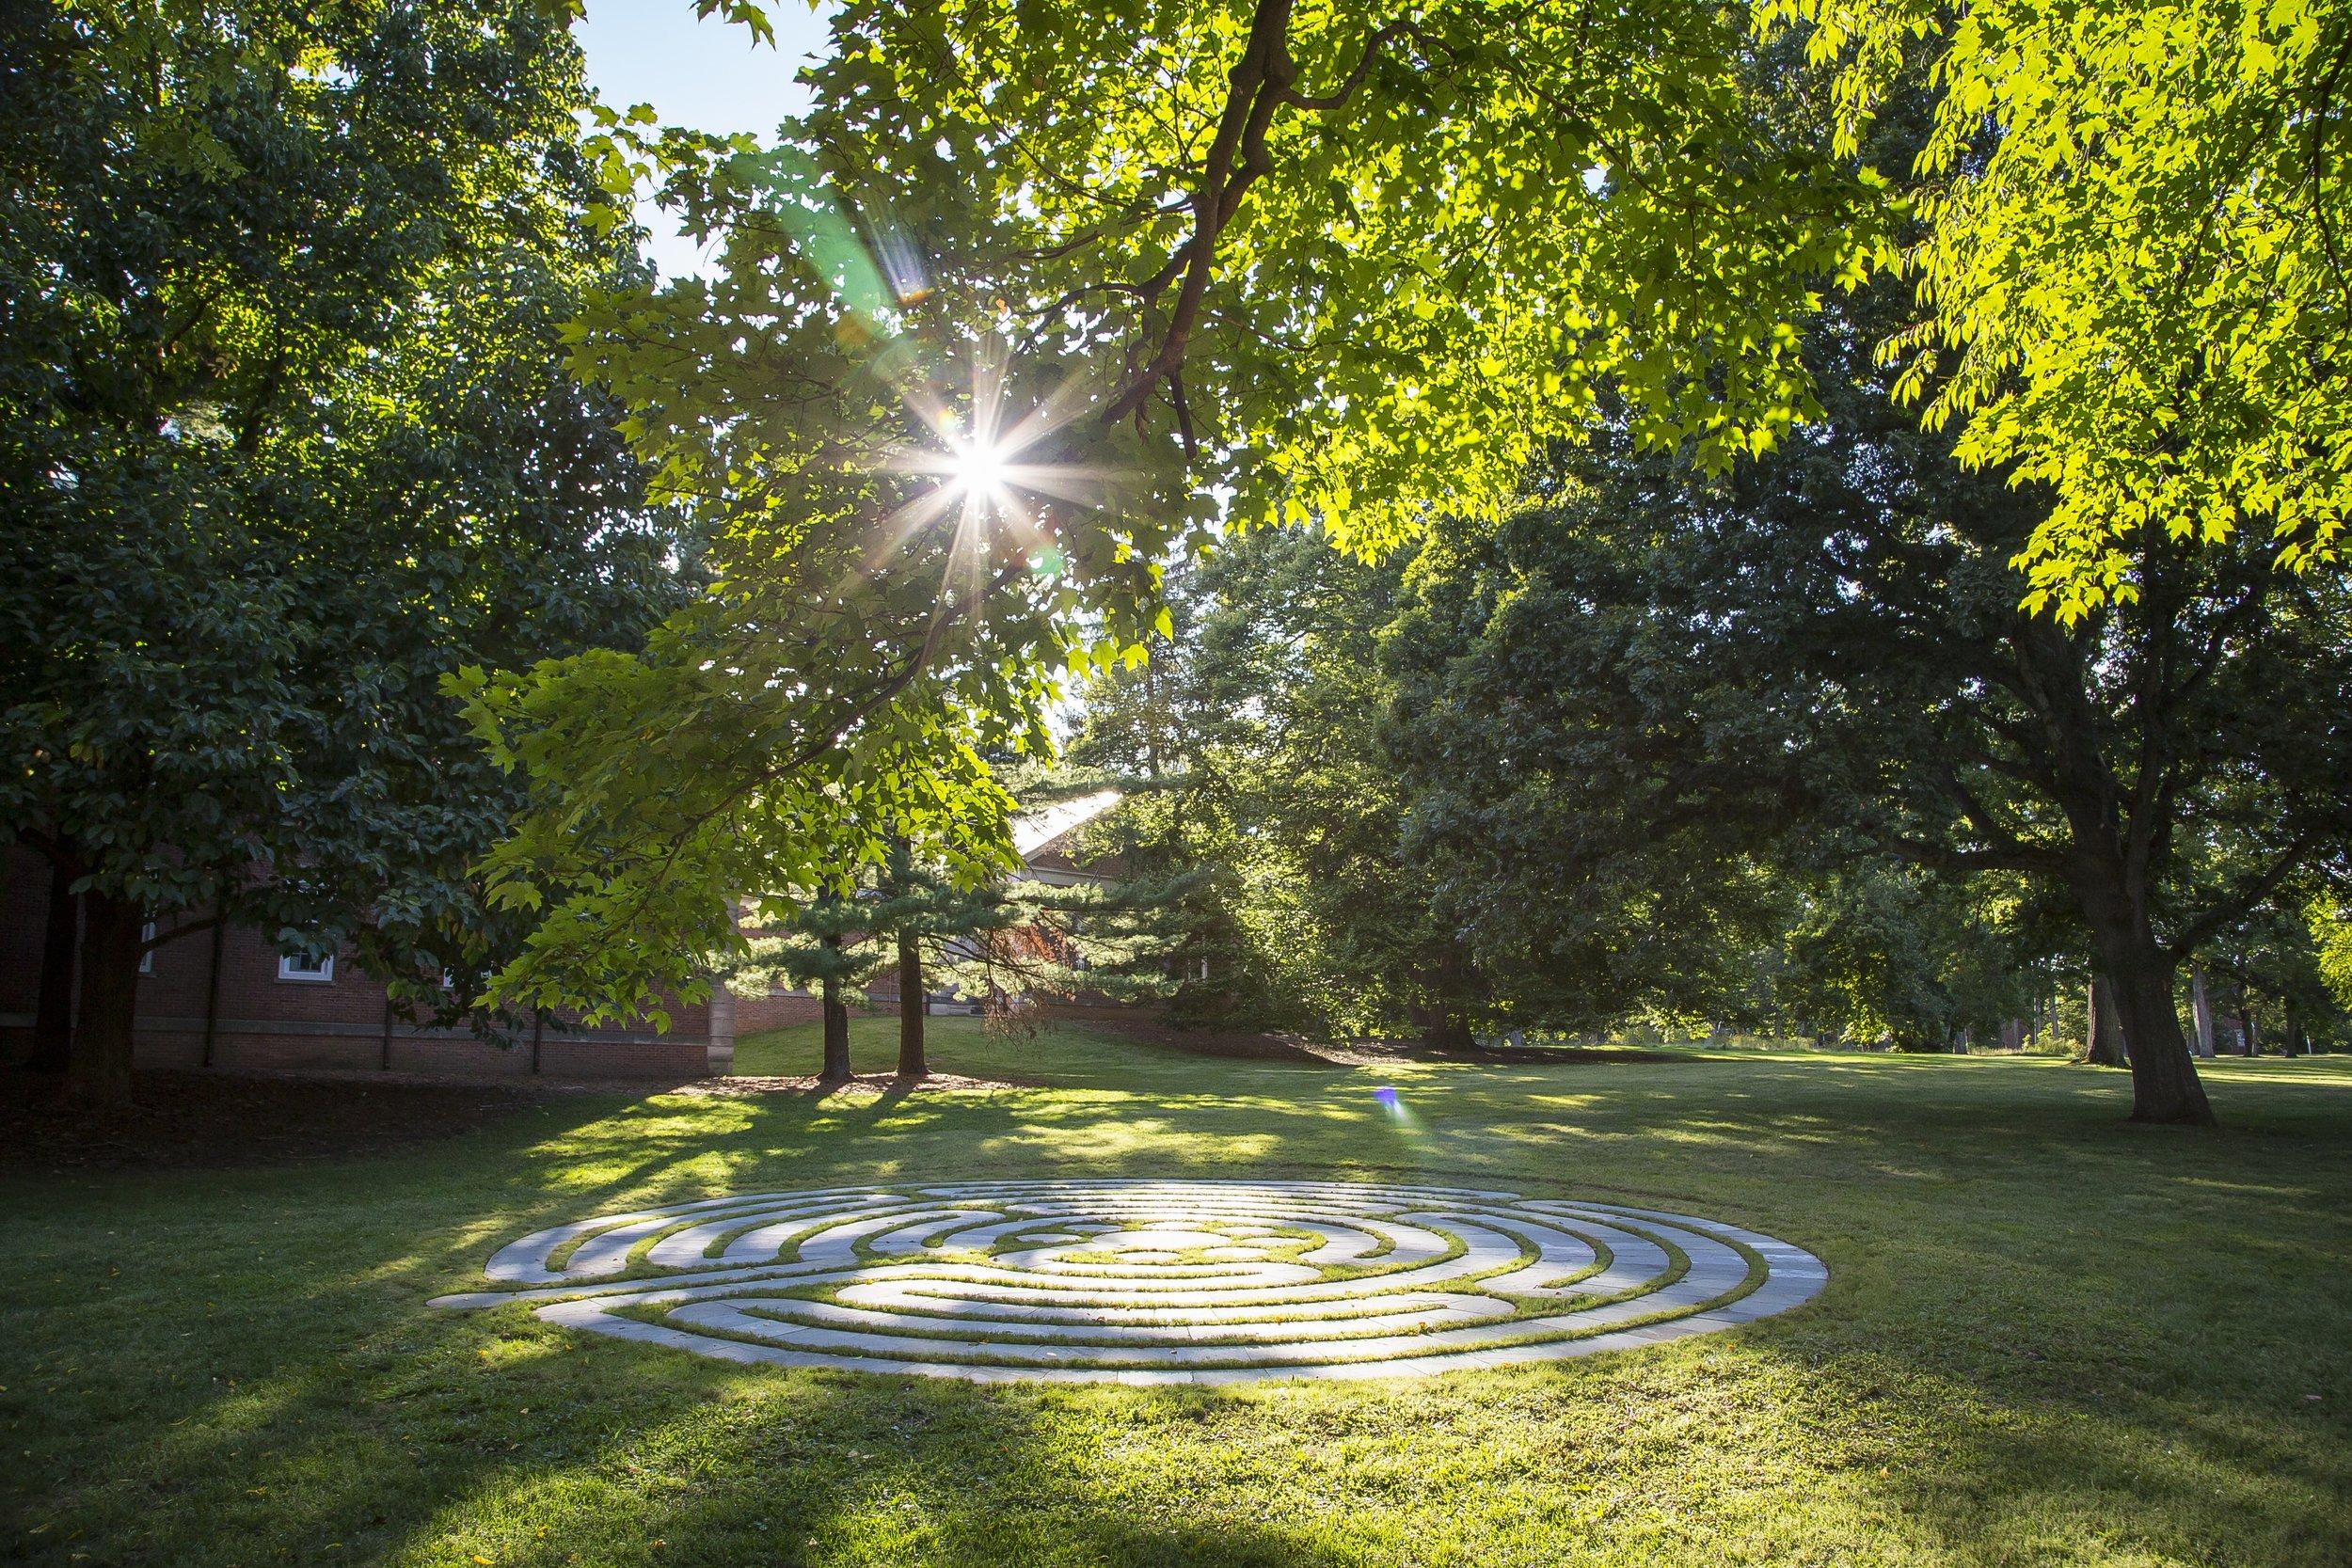 Labyrinth , Drew University, Bluestone, 42 ft/dia, 2015, photography by Lynne DeLade